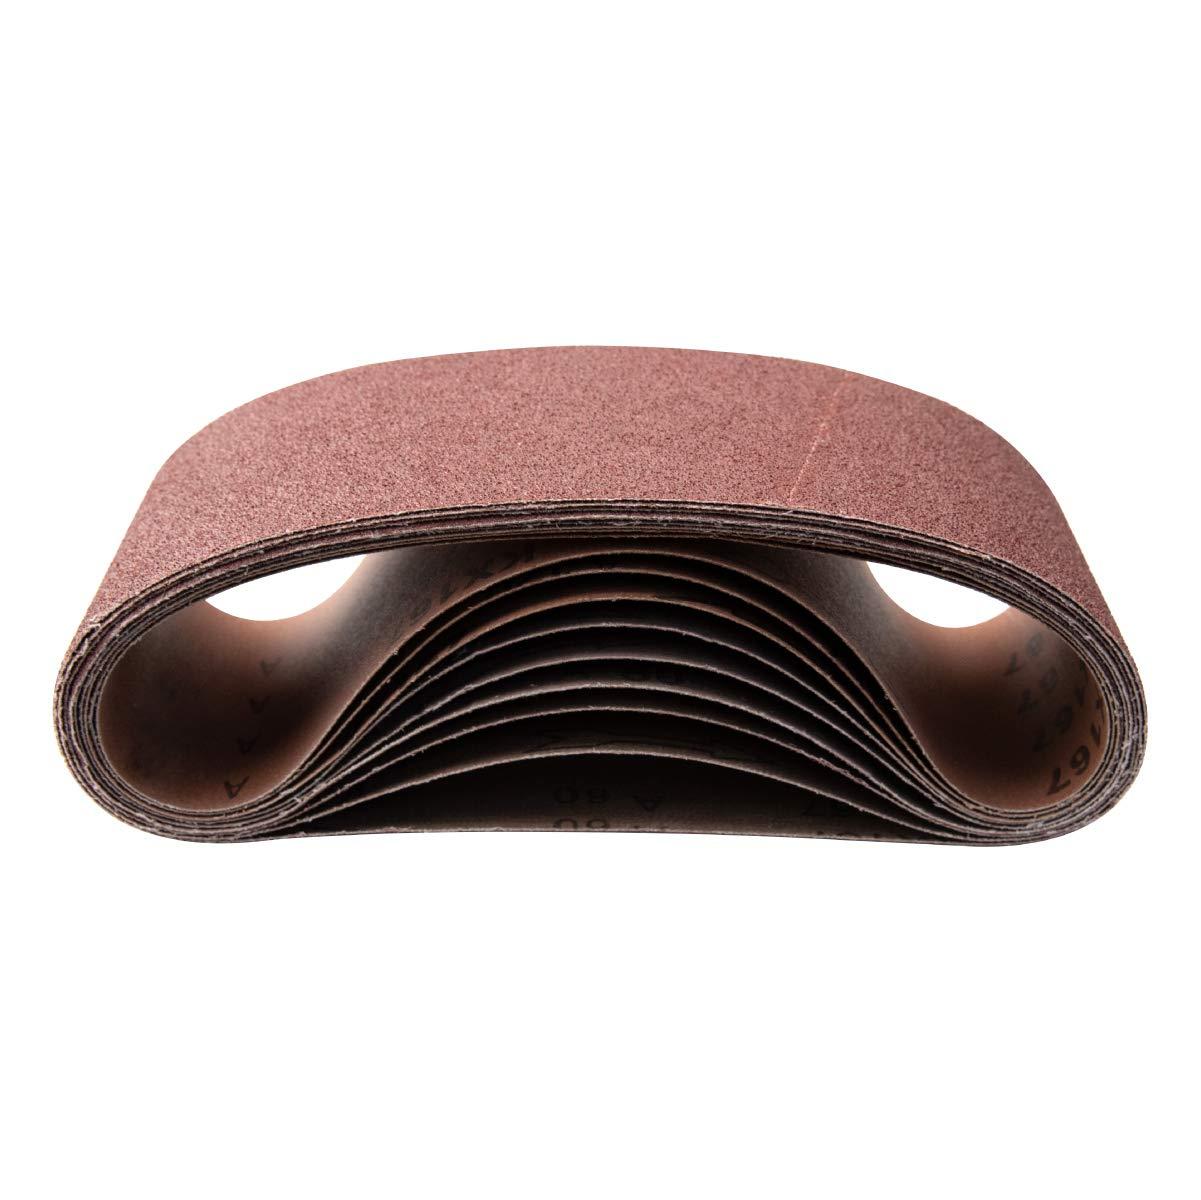 3-Pack POWERTEC 110133 4-Inch x 36-Inch 100 Grit Aluminum Oxide Sanding Belt